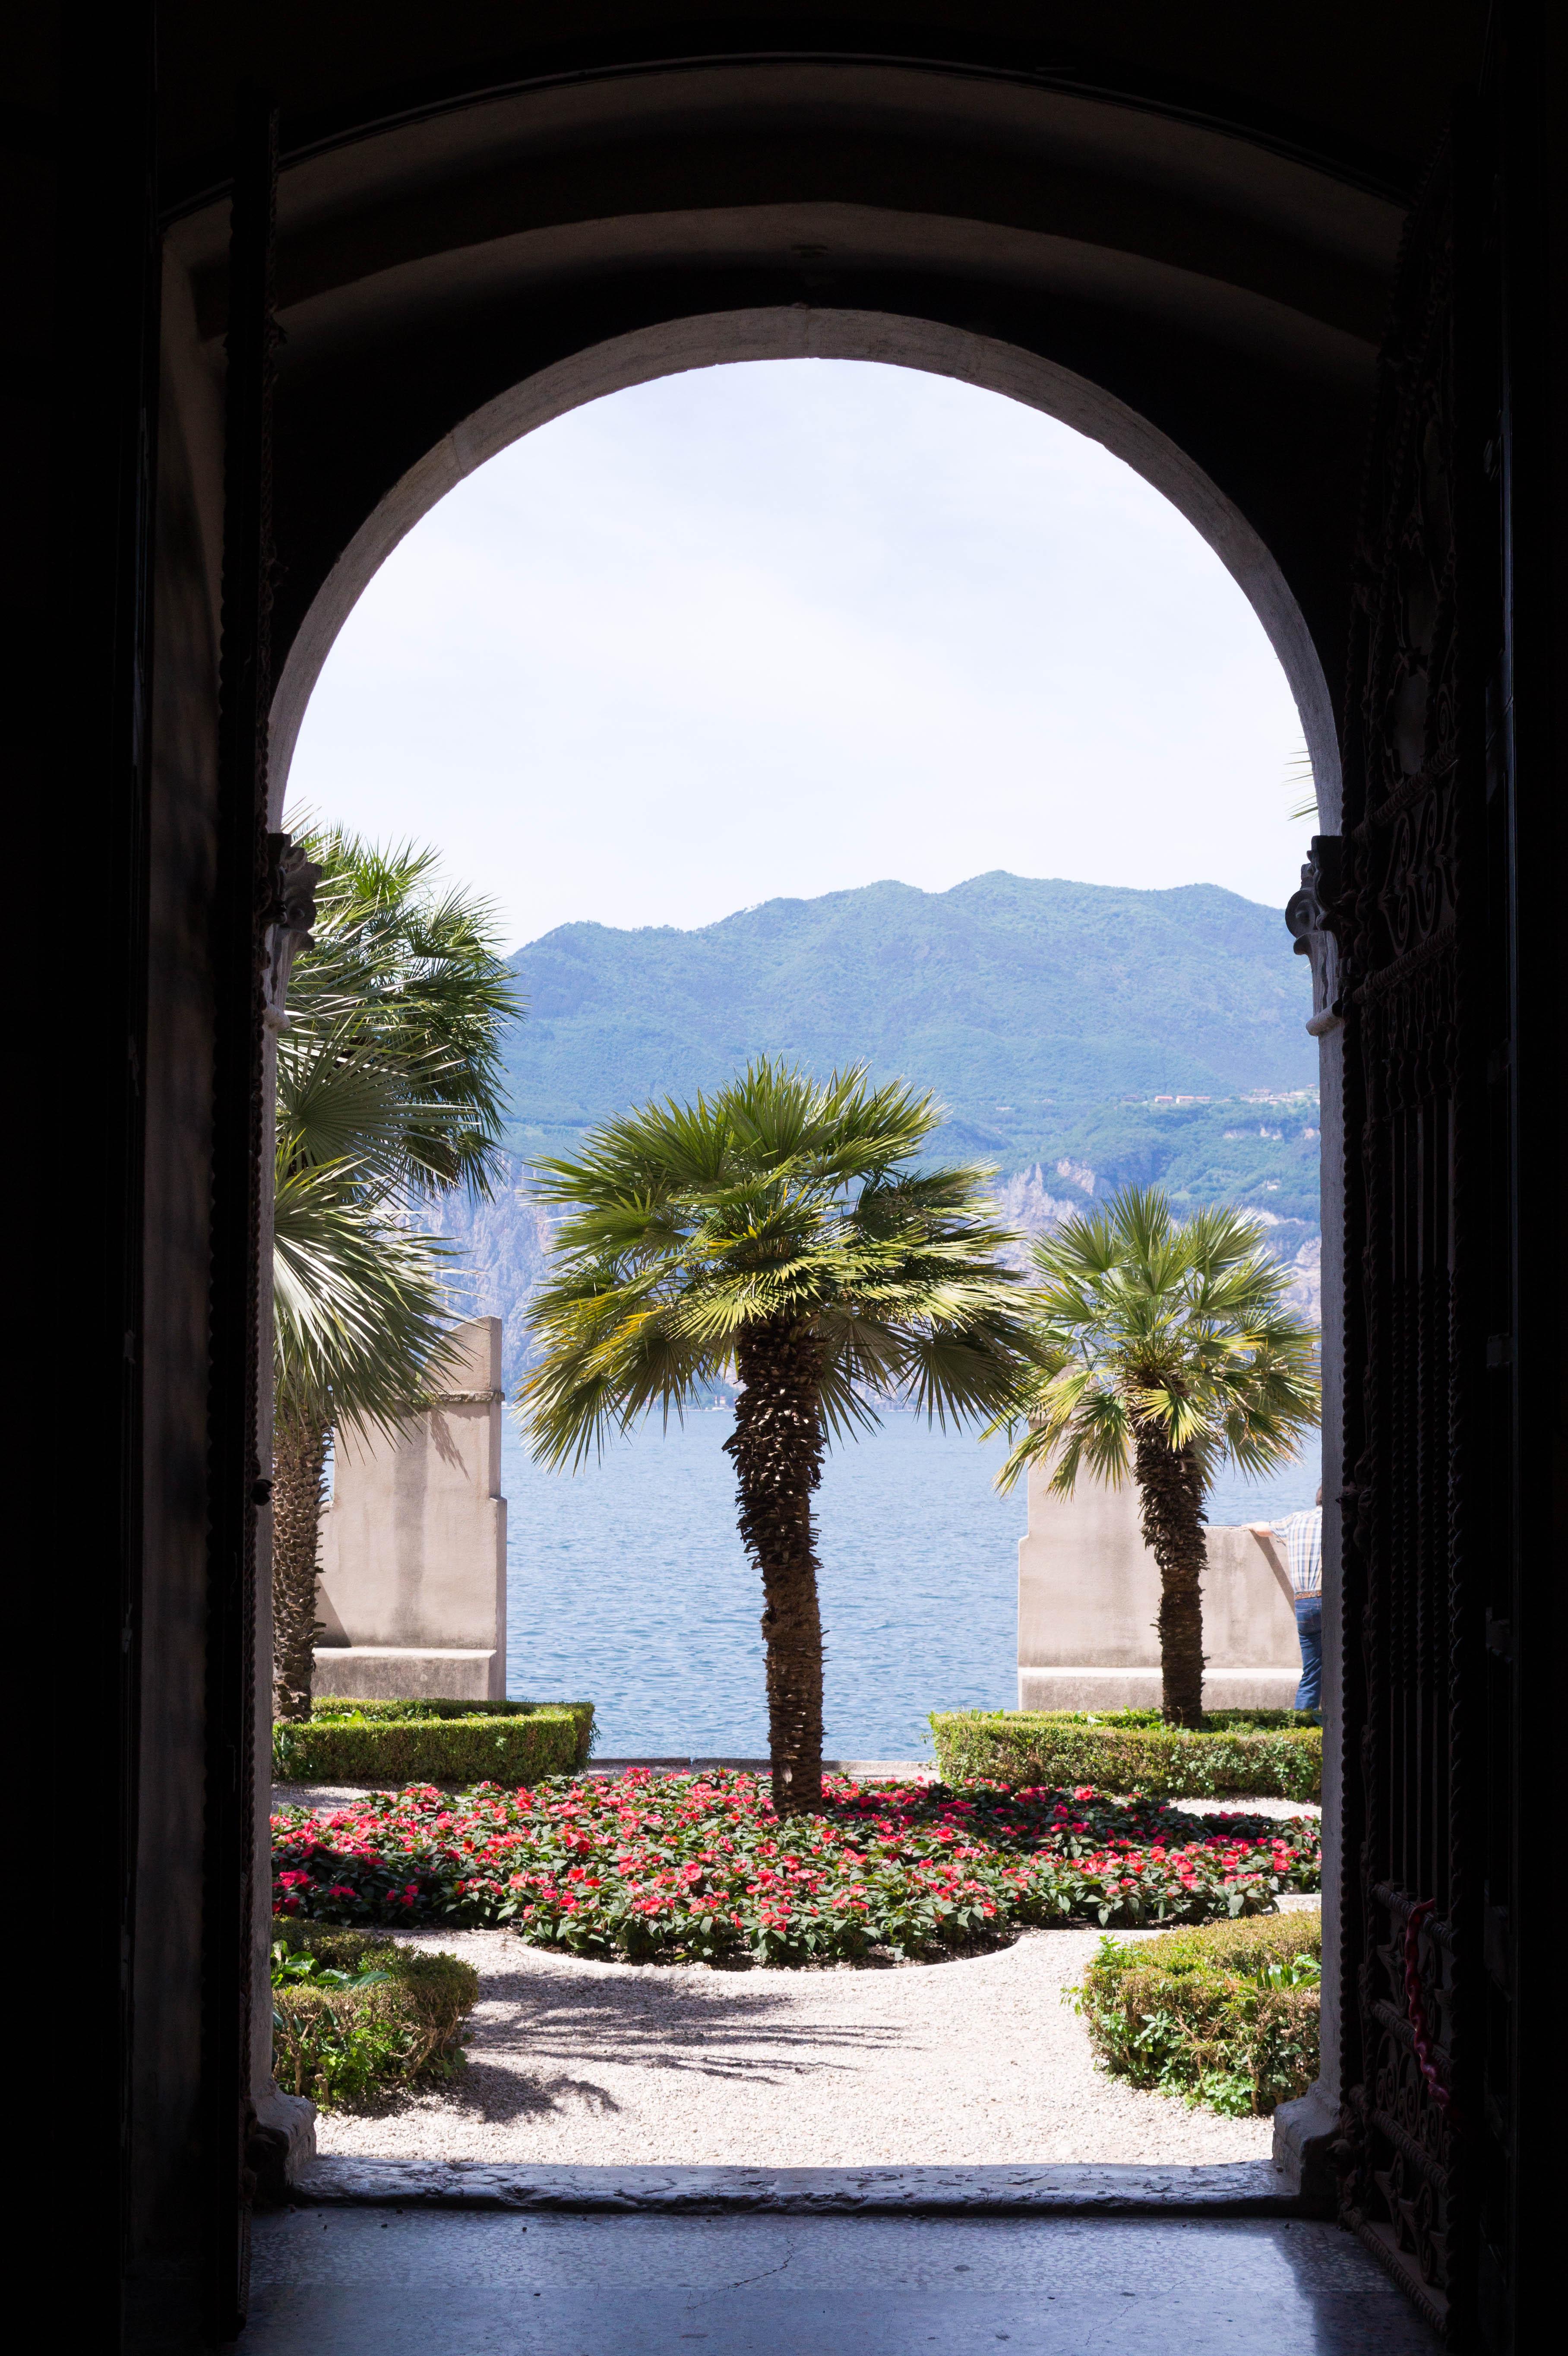 lake garda lago di garda malcesine italy italien italia summer travel post